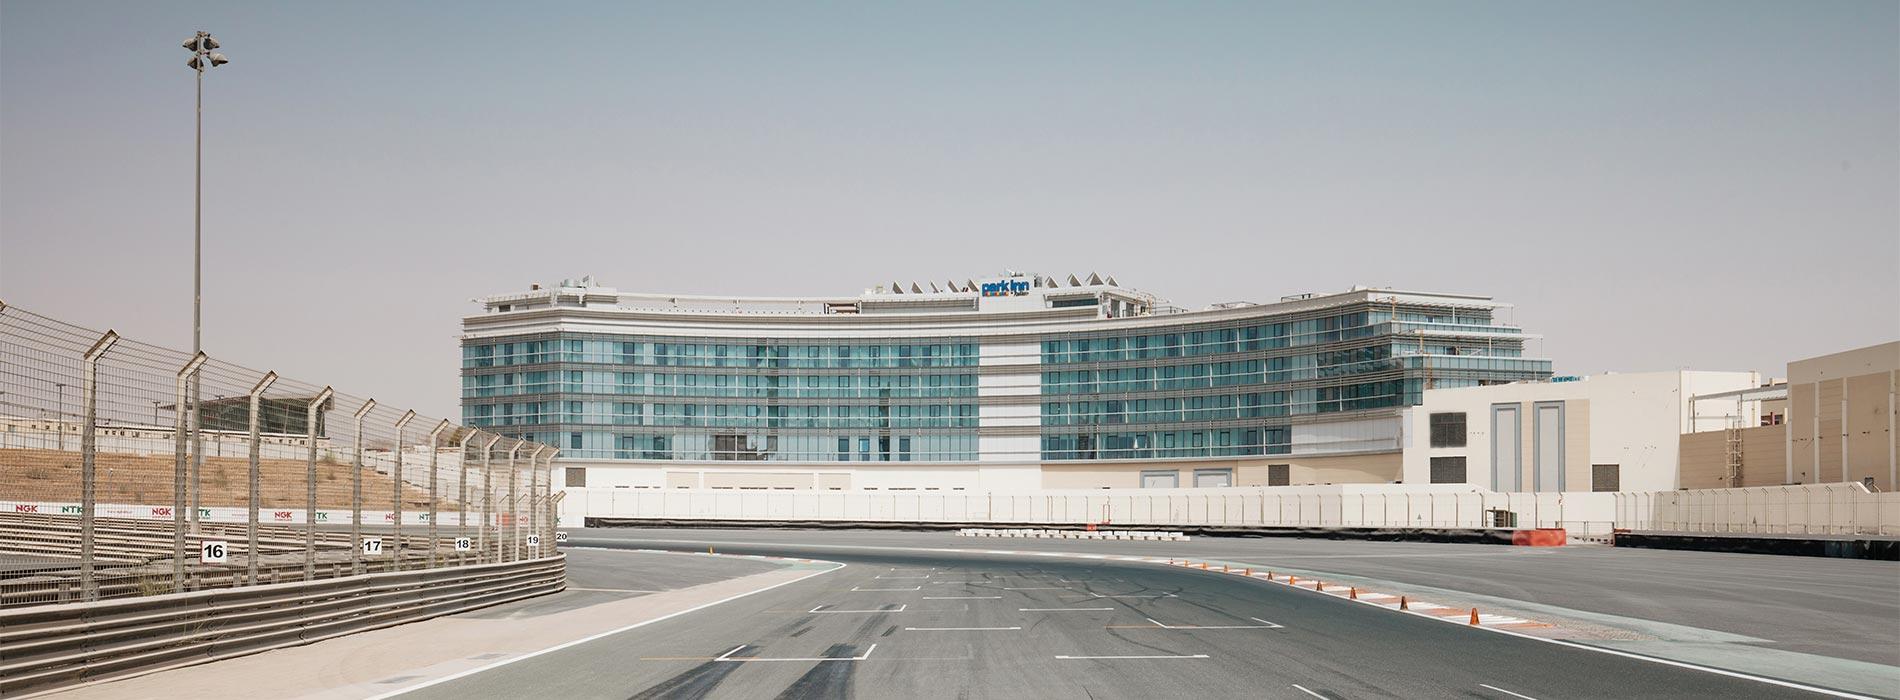 New radisson blu hotel apartments dubai silicon oasis for Hotels in motor city dubai